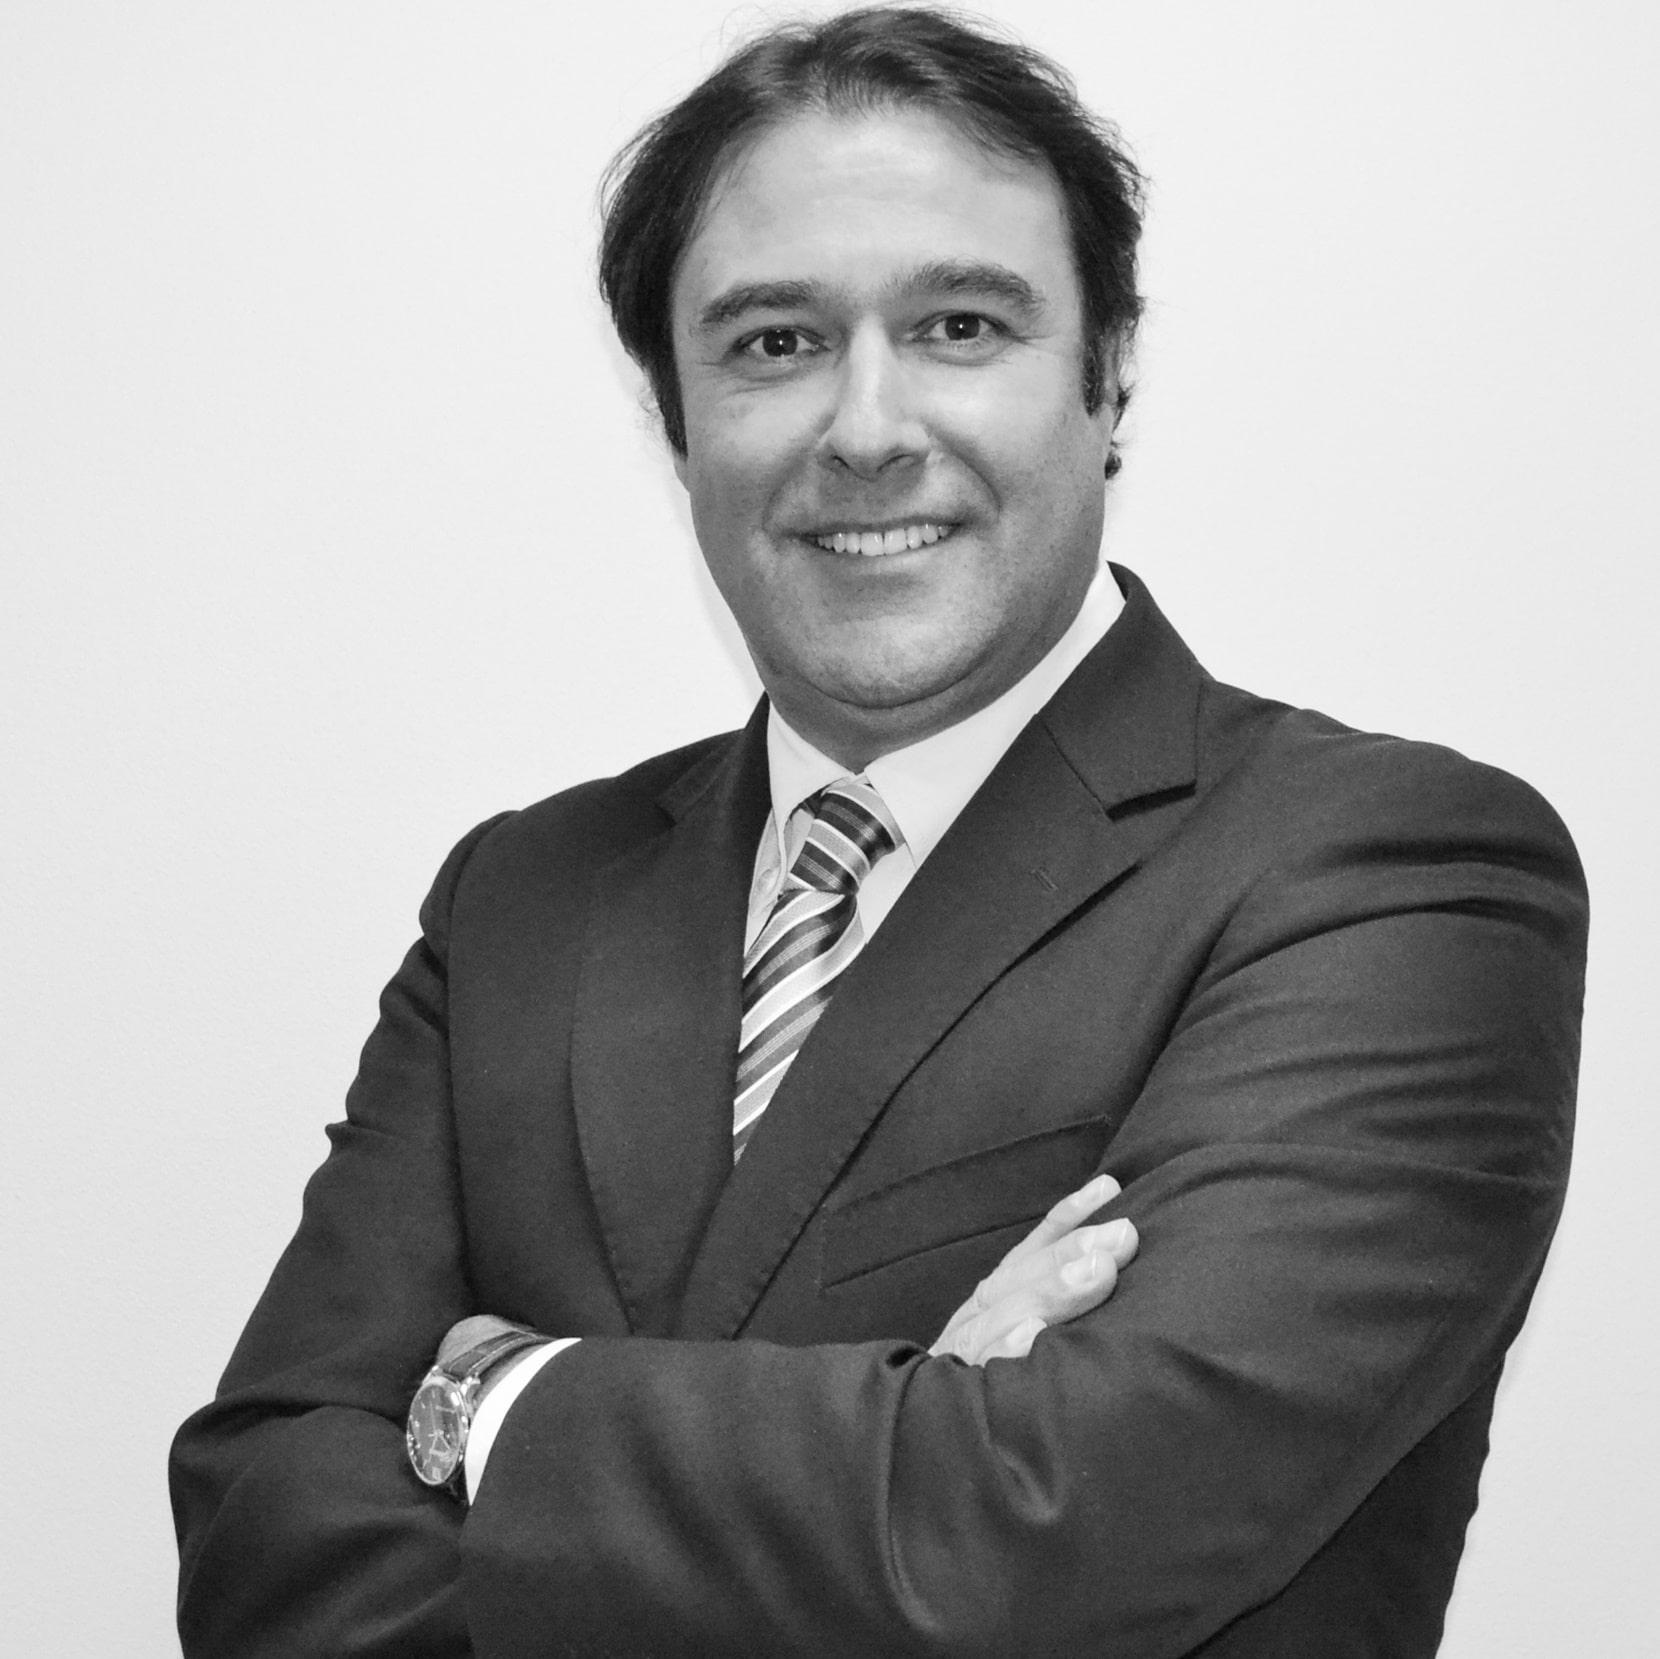 Marco Vergara